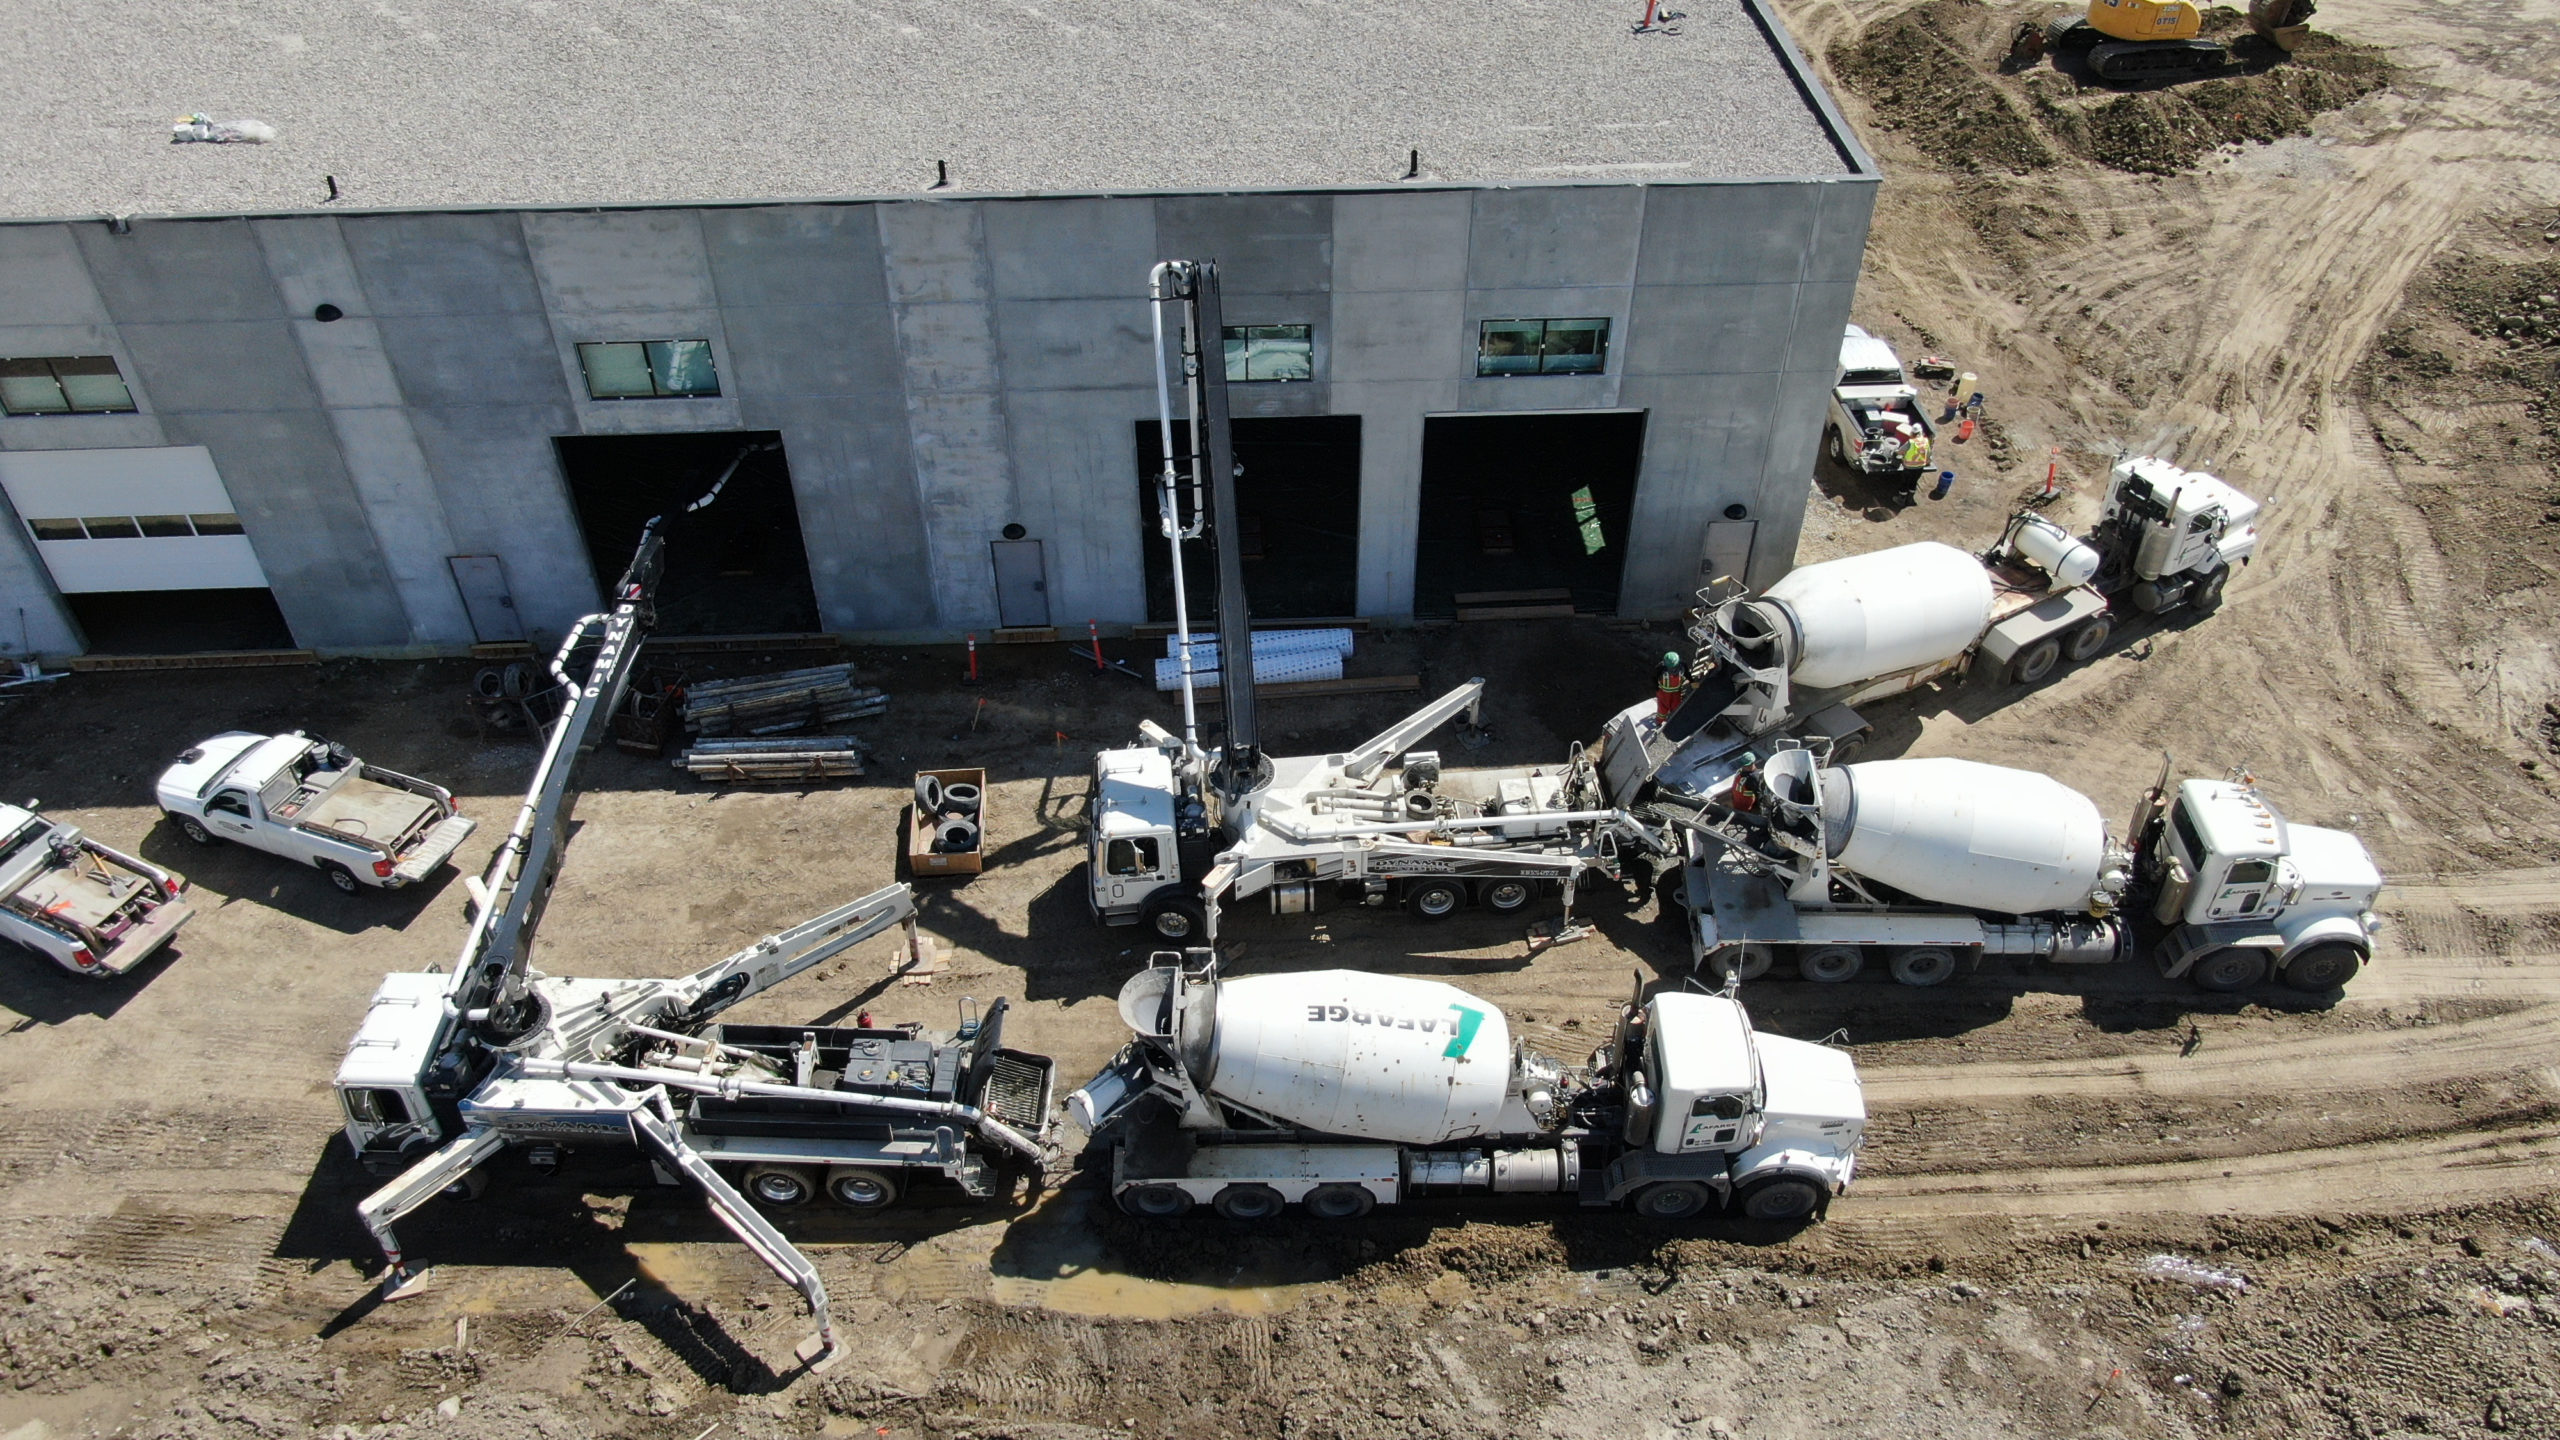 Dynamic Concrete Pumping pumping concrete into the HF11 industrial condo development